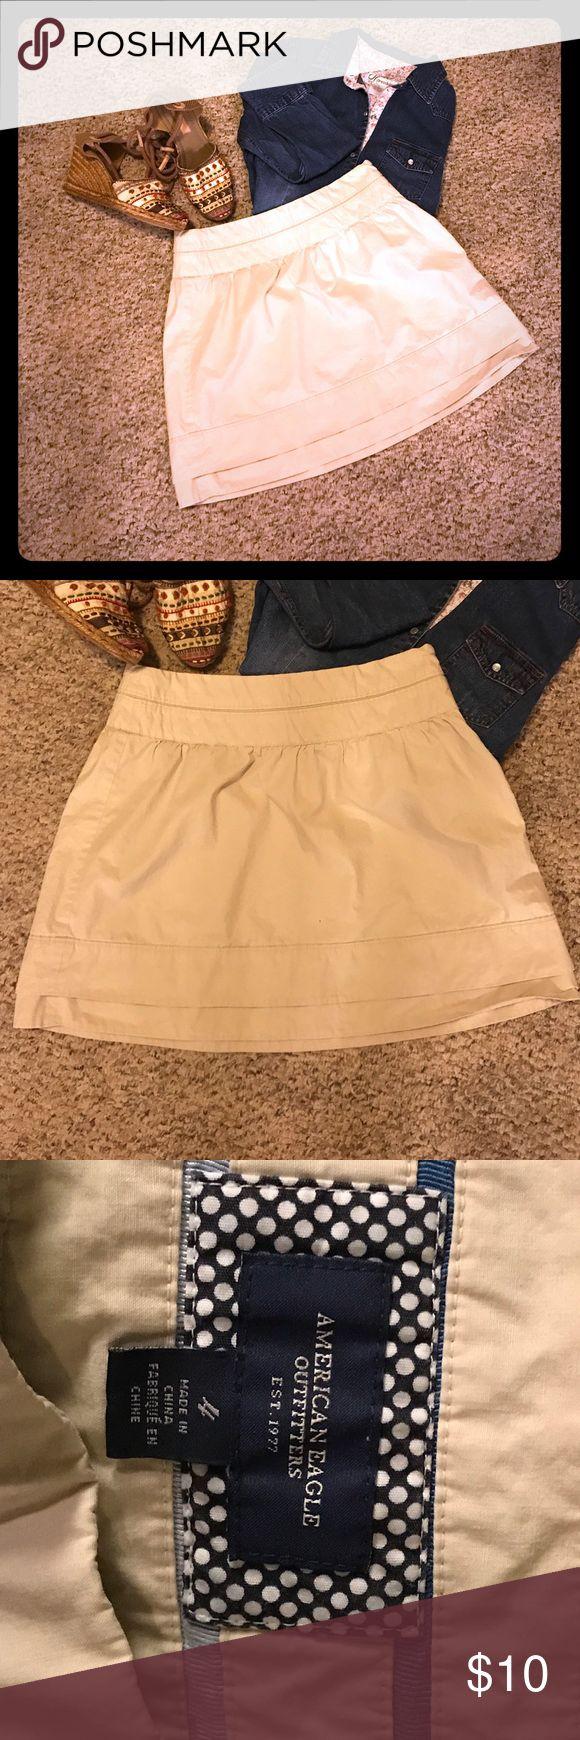 American Eagle Khaki Skirt American Eagle Outfitters Khaki mini skirt size 4 American Eagle Outfitters Skirts Mini